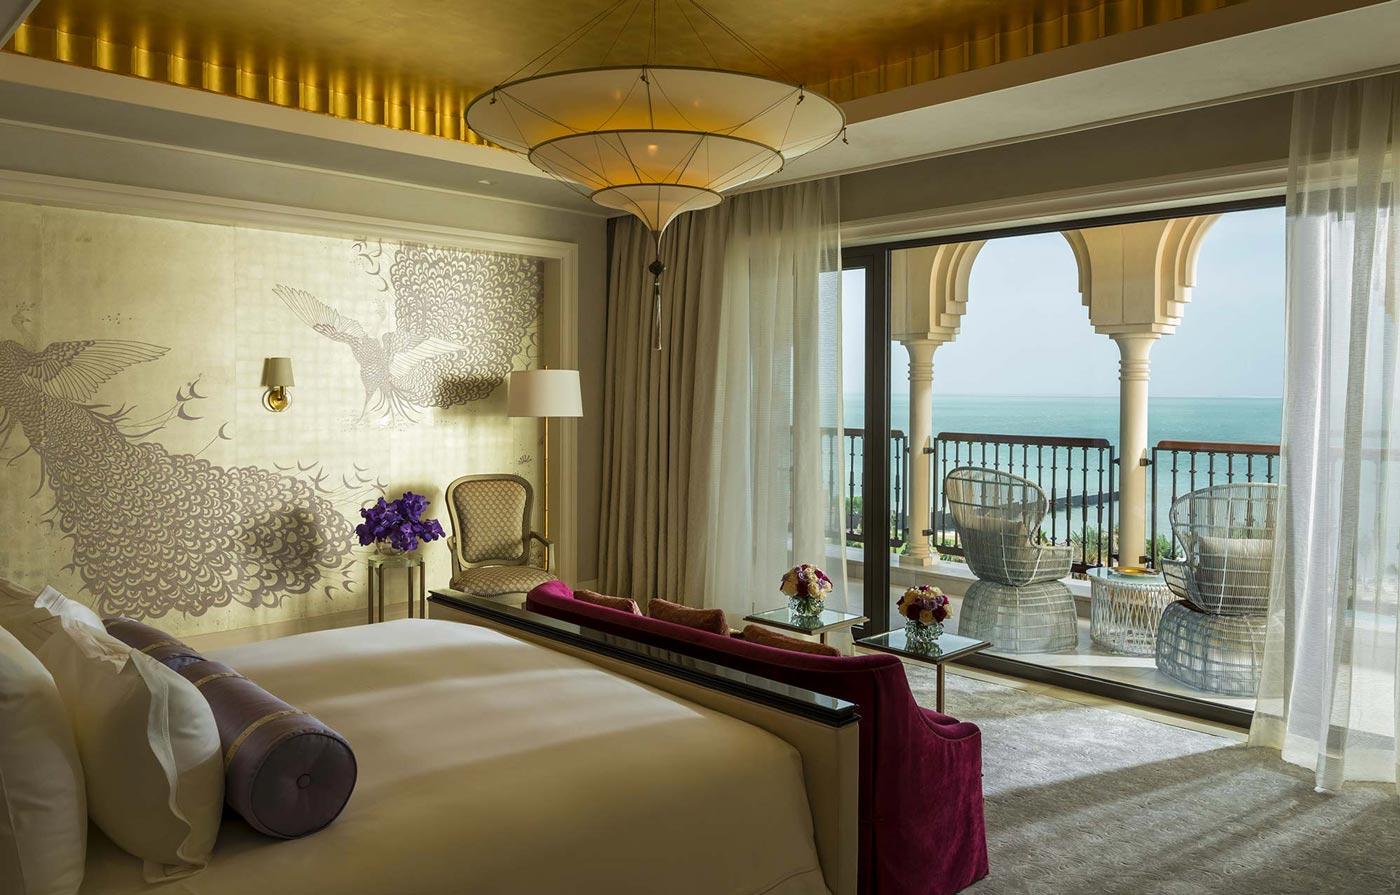 Lampada in seta Scheherazade 3 dischi senza decorazioni nell'Hotel Four Seasons Resort Hotel a Dubai, camera matrimoniale Royal Suite